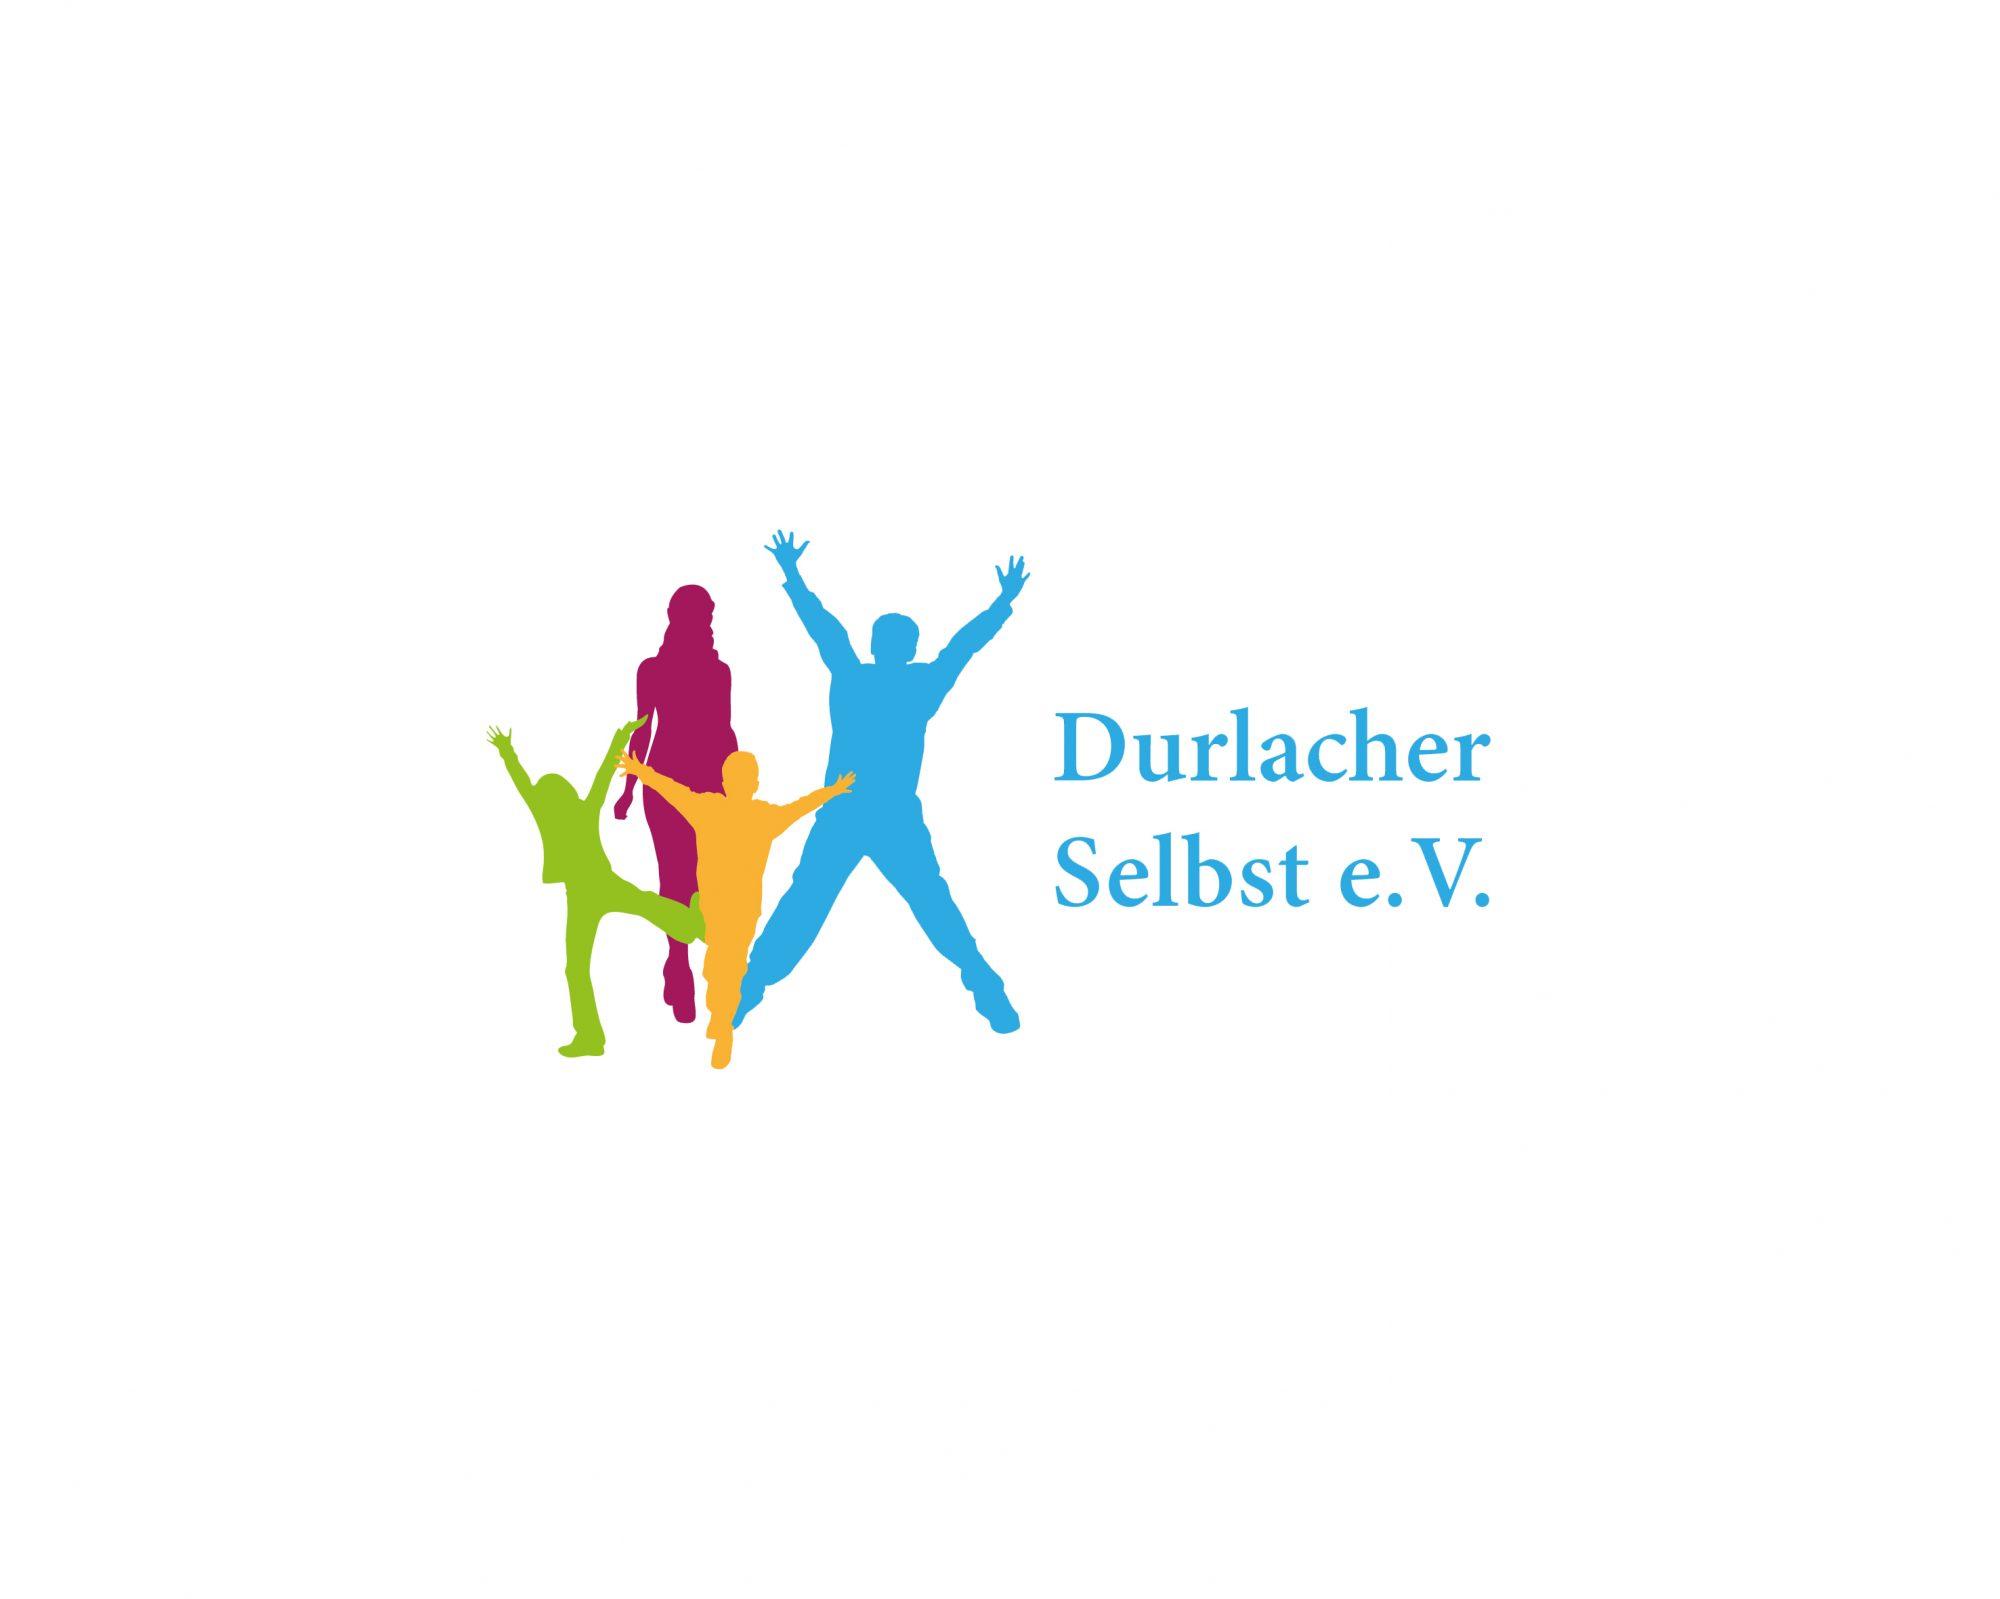 Durlacher Selbst e.V.